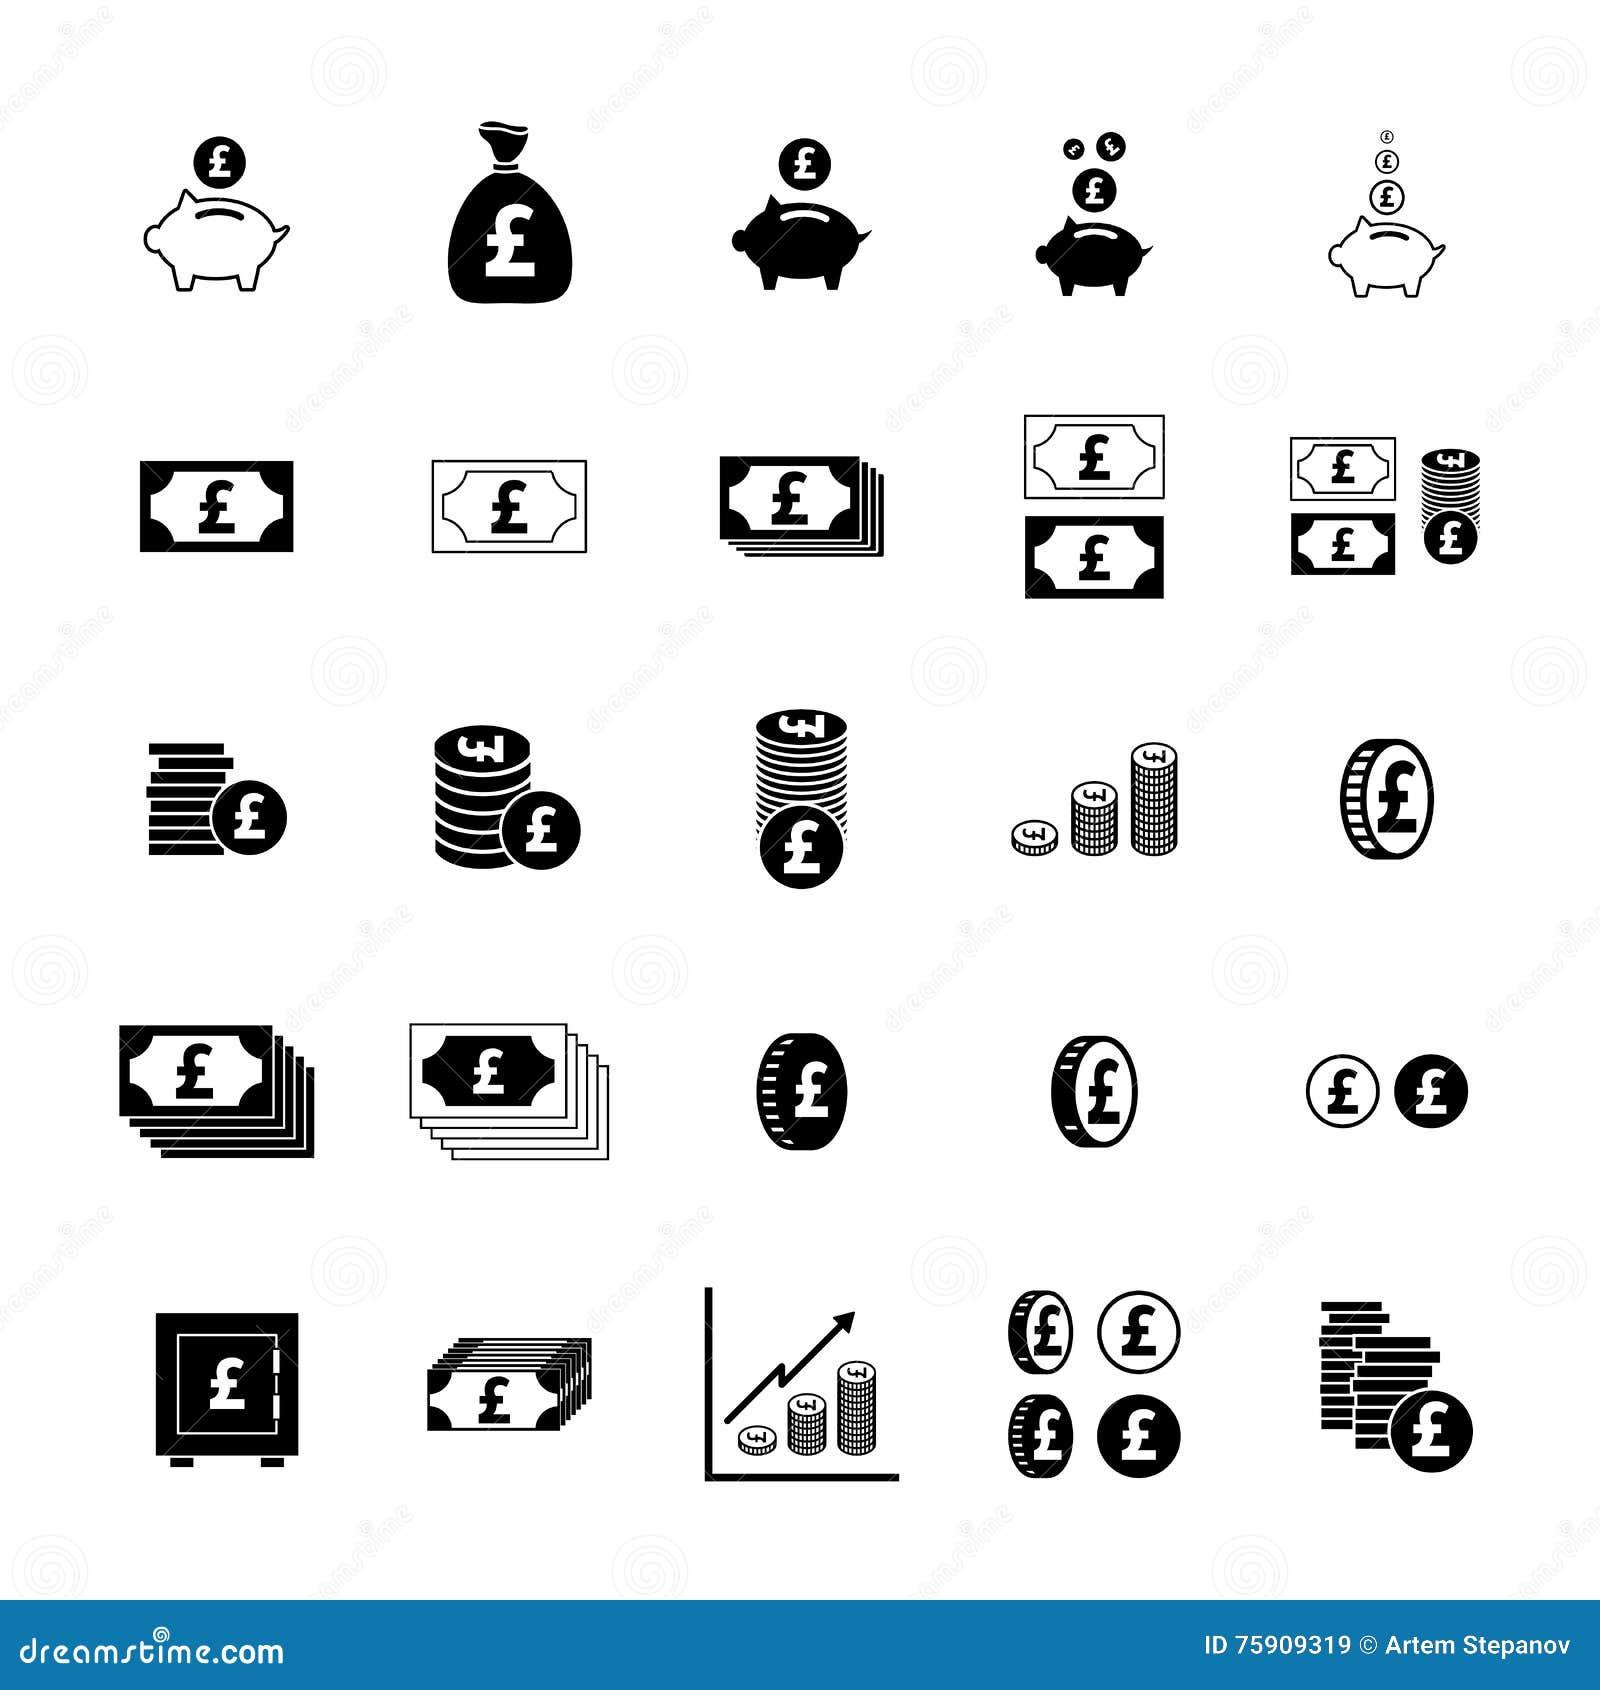 Money Pound Icon Stock Illustration Illustration Of Pound 75909319